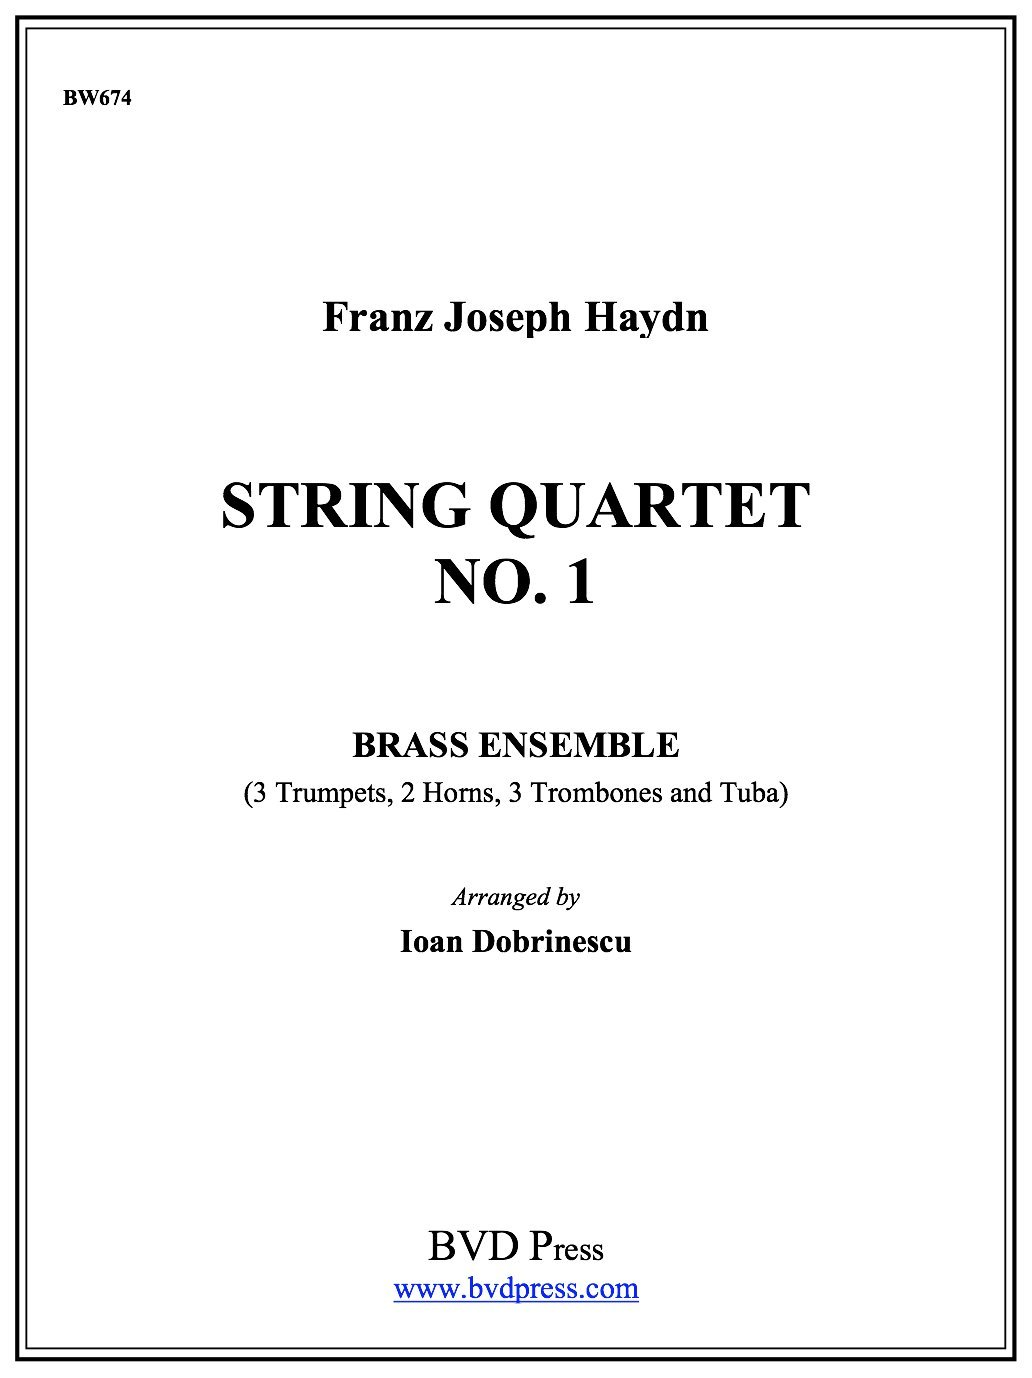 Download String Quartet in Bb, Op. 1, No. 1 pdf